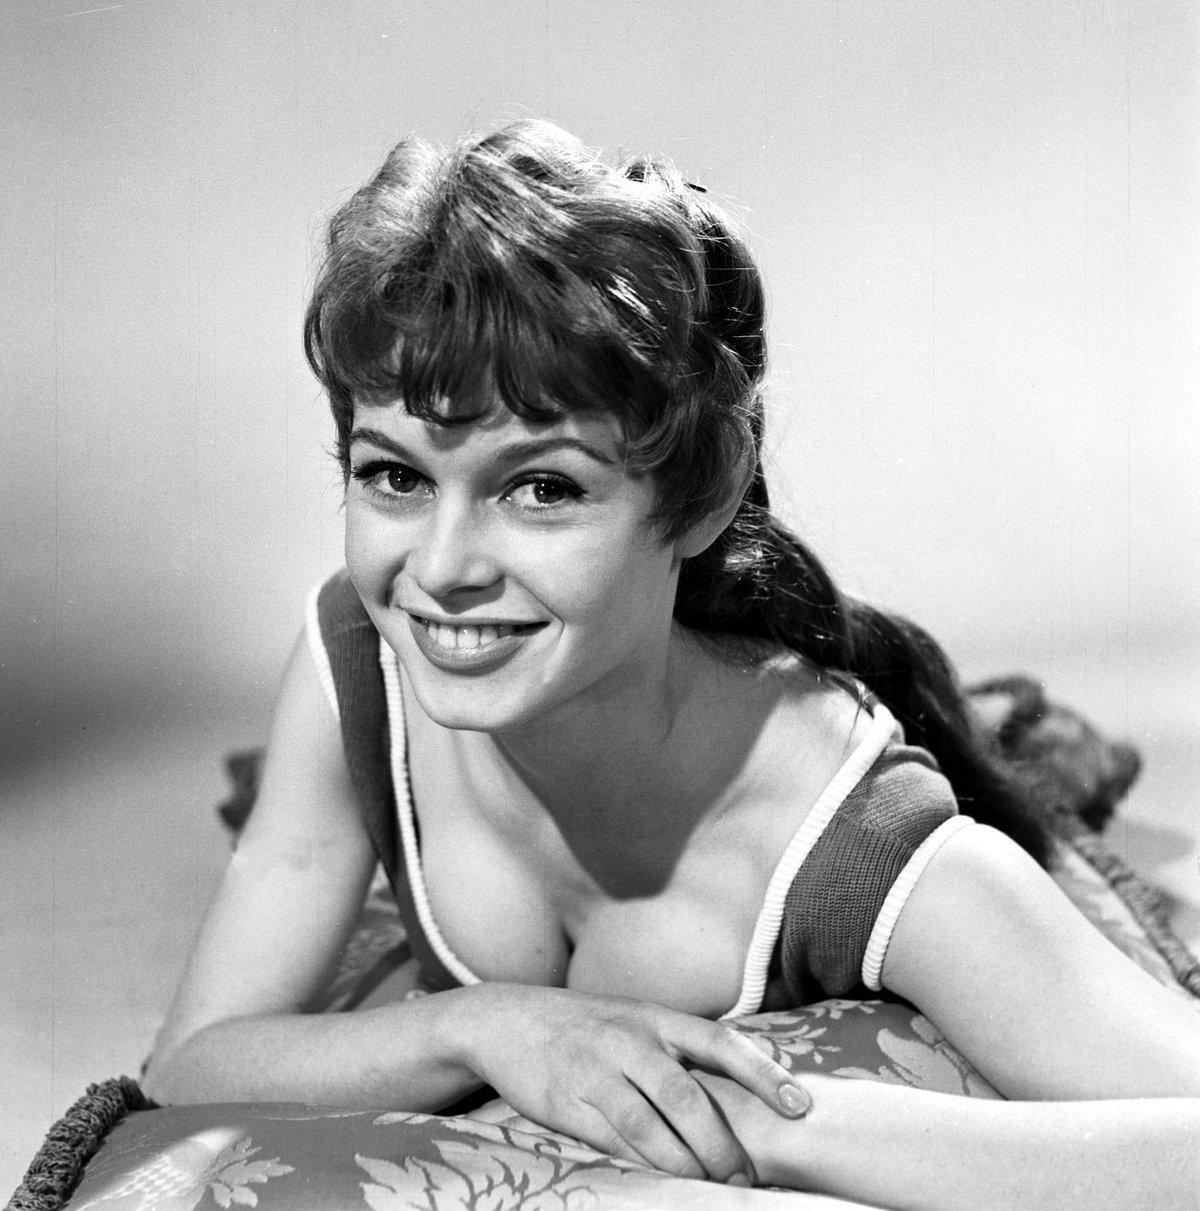 Brigitte měla zamlada tmavé vlasy.